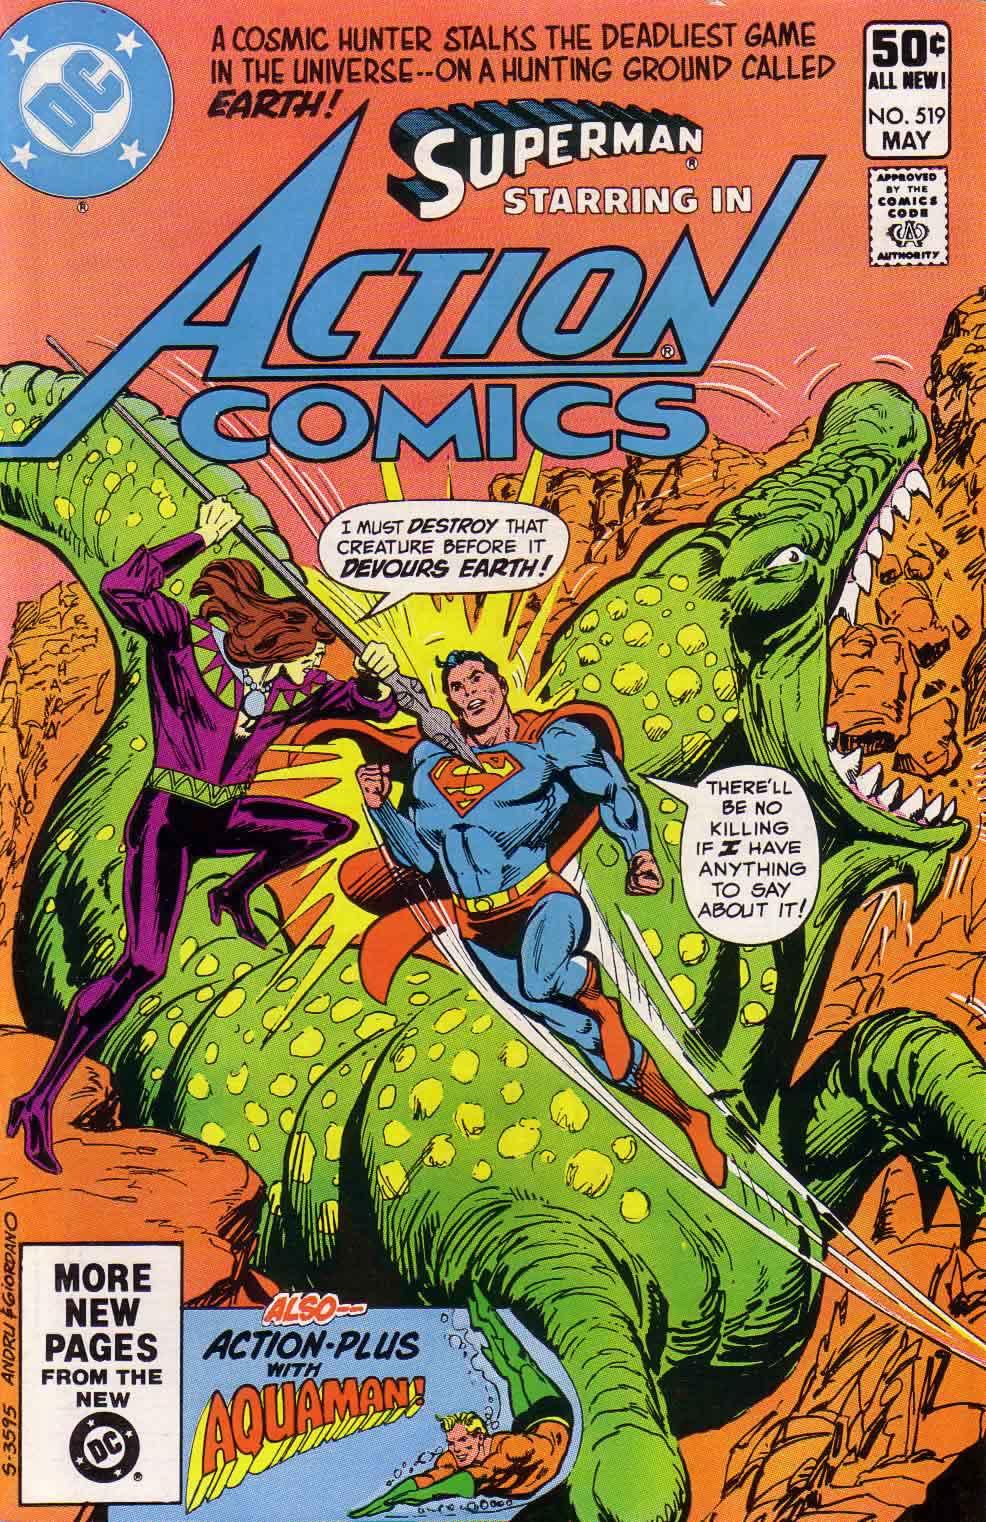 Action Comics (1938) 519 Page 1